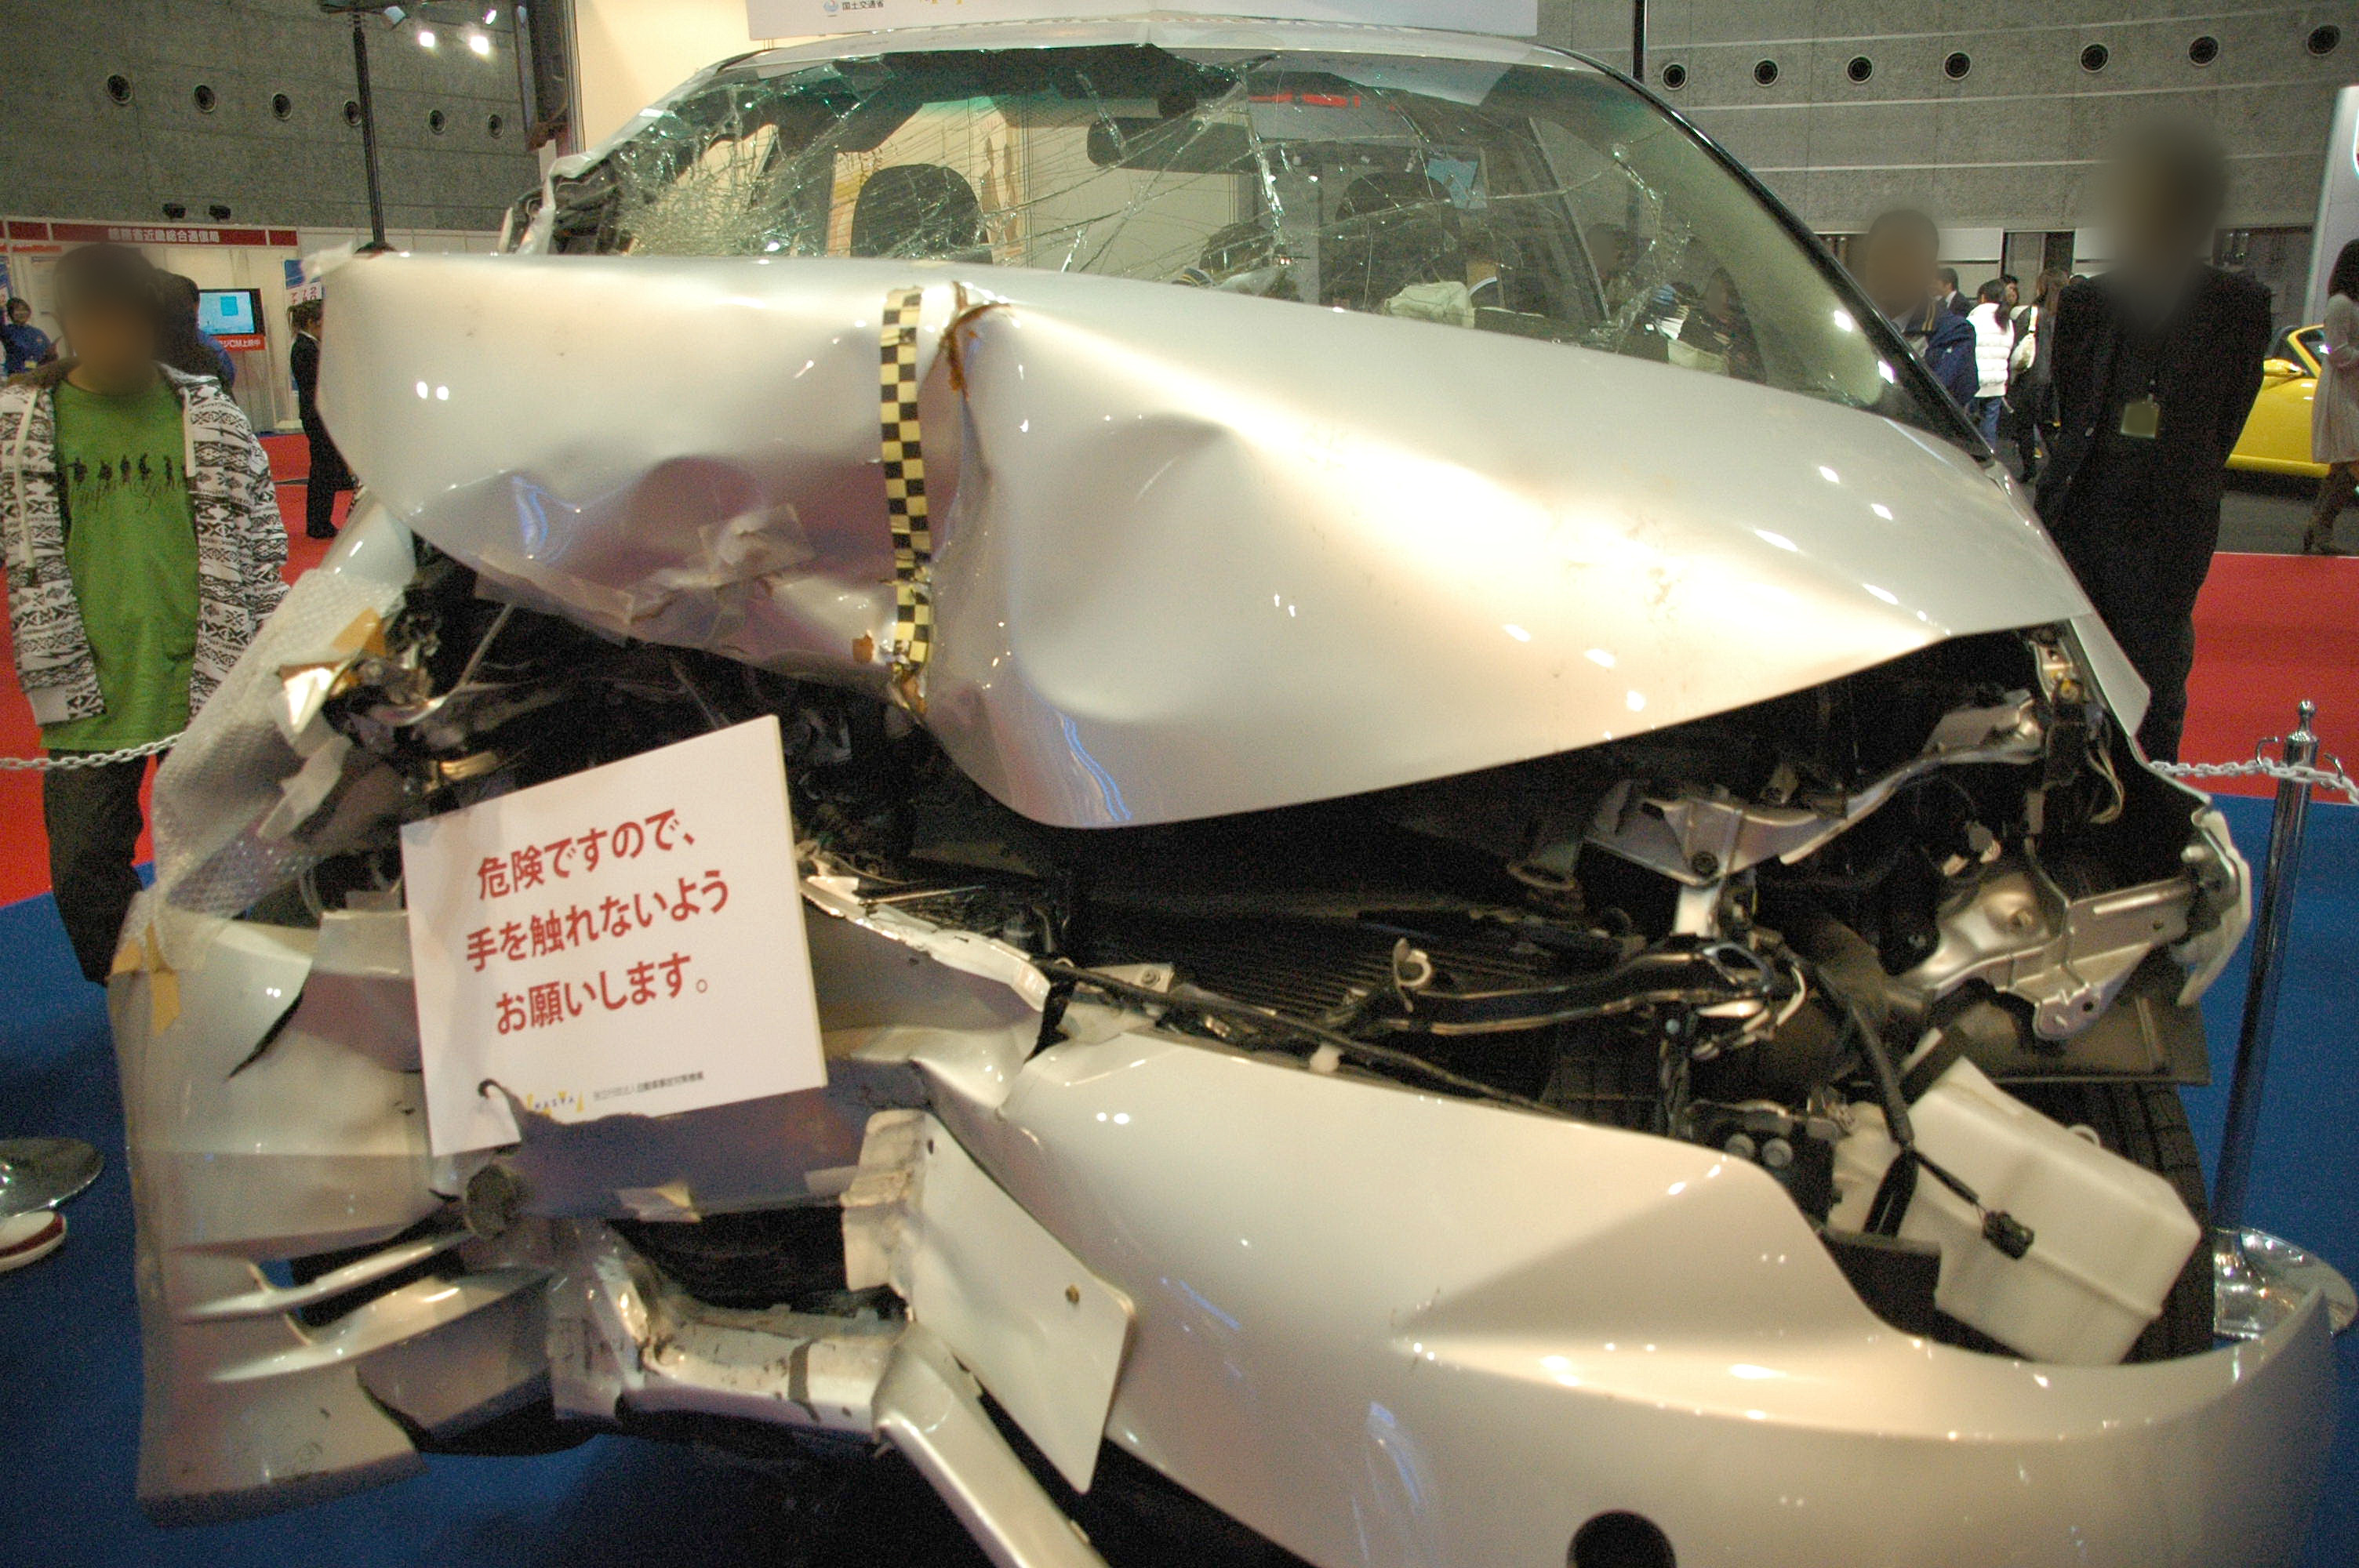 lisa lopes car crash - HD3008×2000